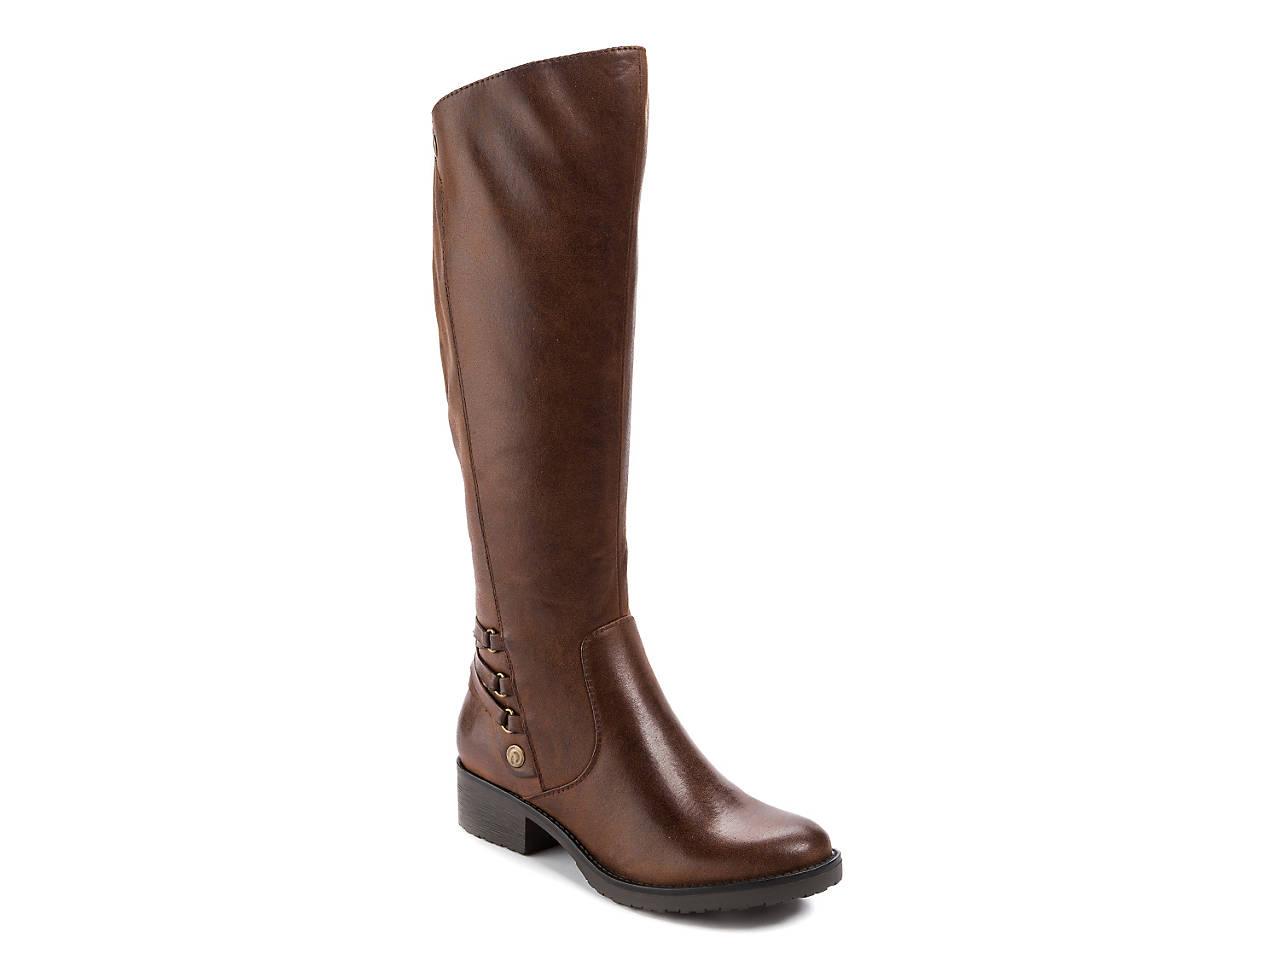 2ddb7566aa1 Bare Traps Ornella Wide Calf Riding Boot Women s Shoes